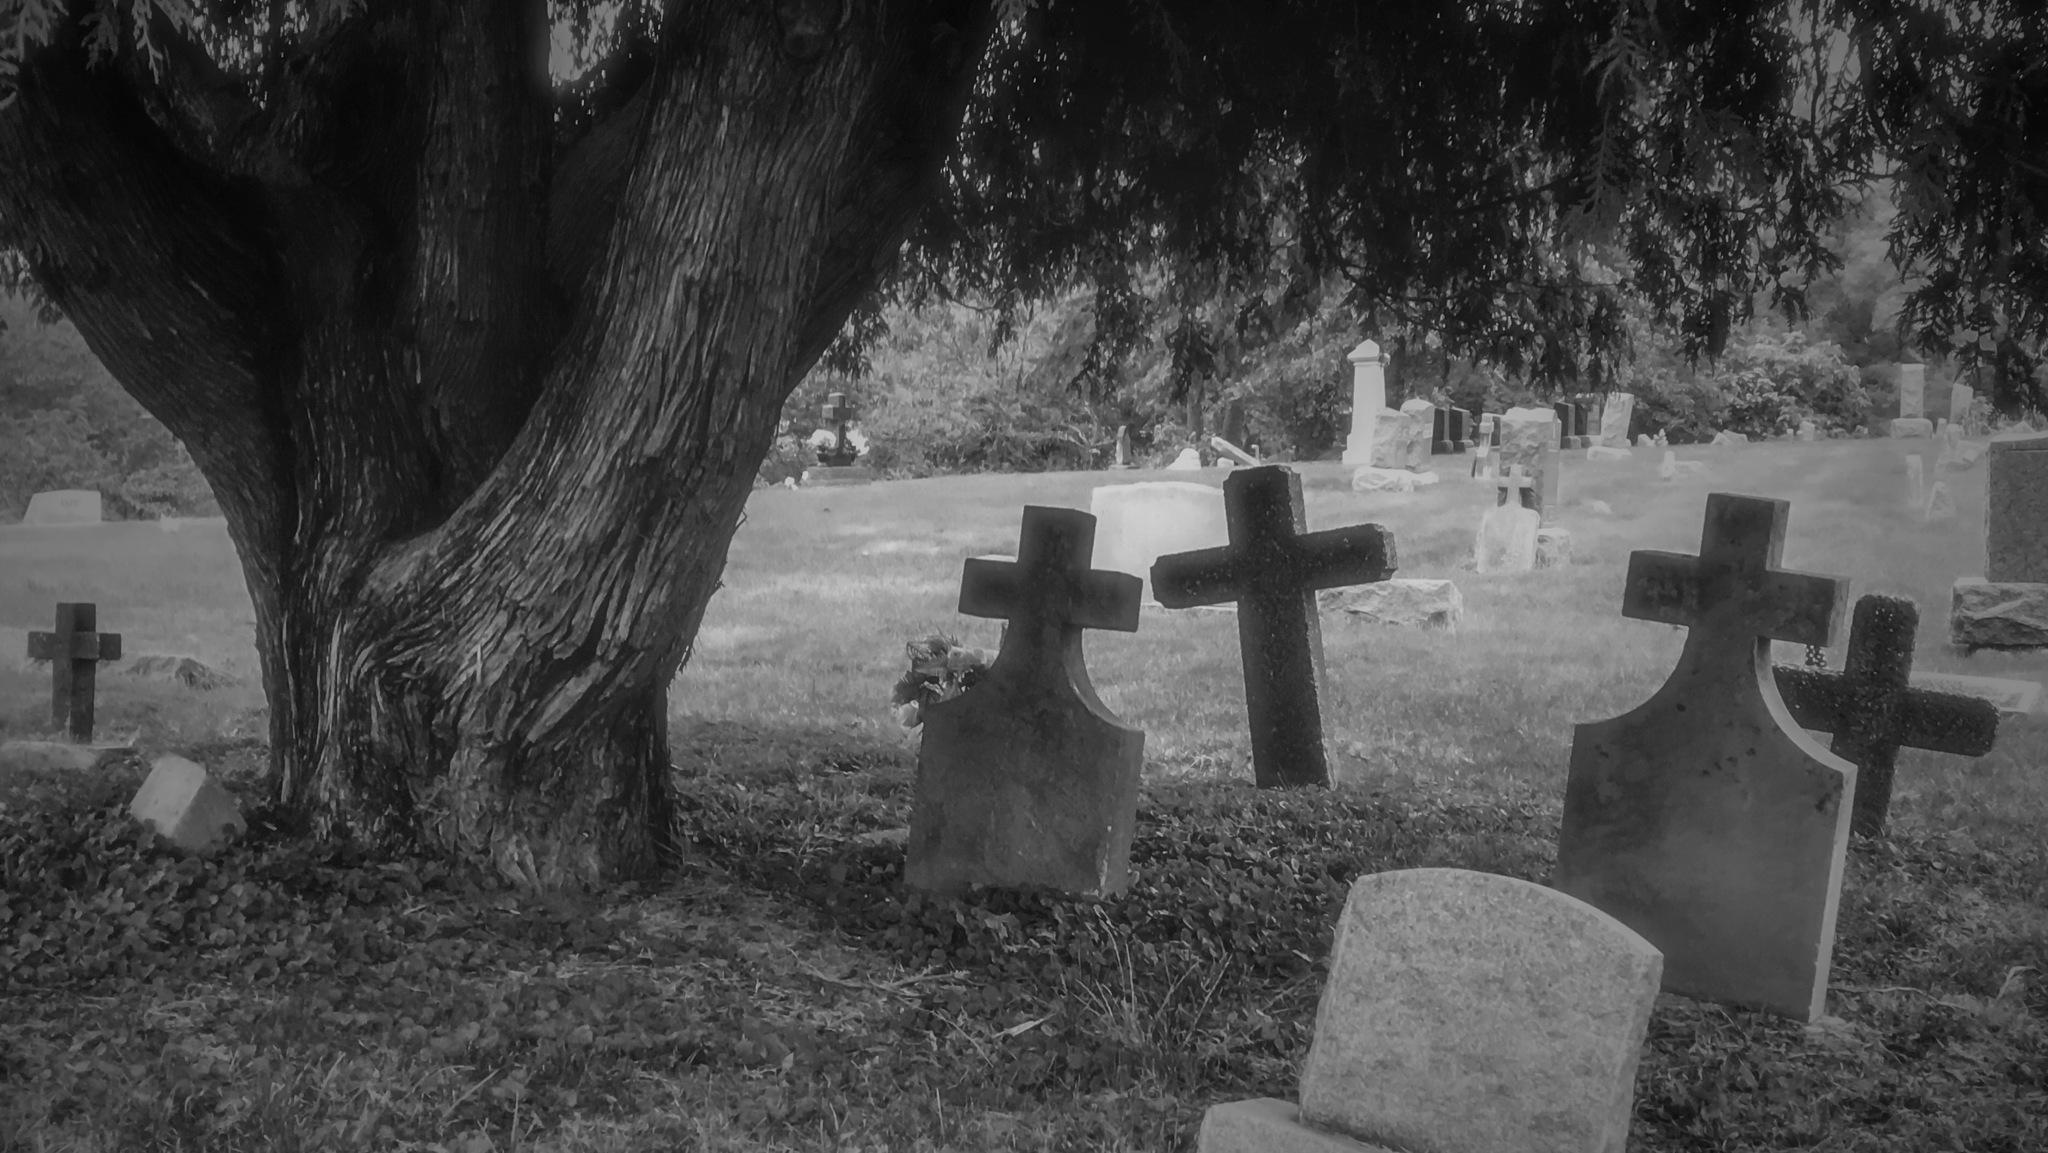 Fall / Halloween Scene by Mark Hootman